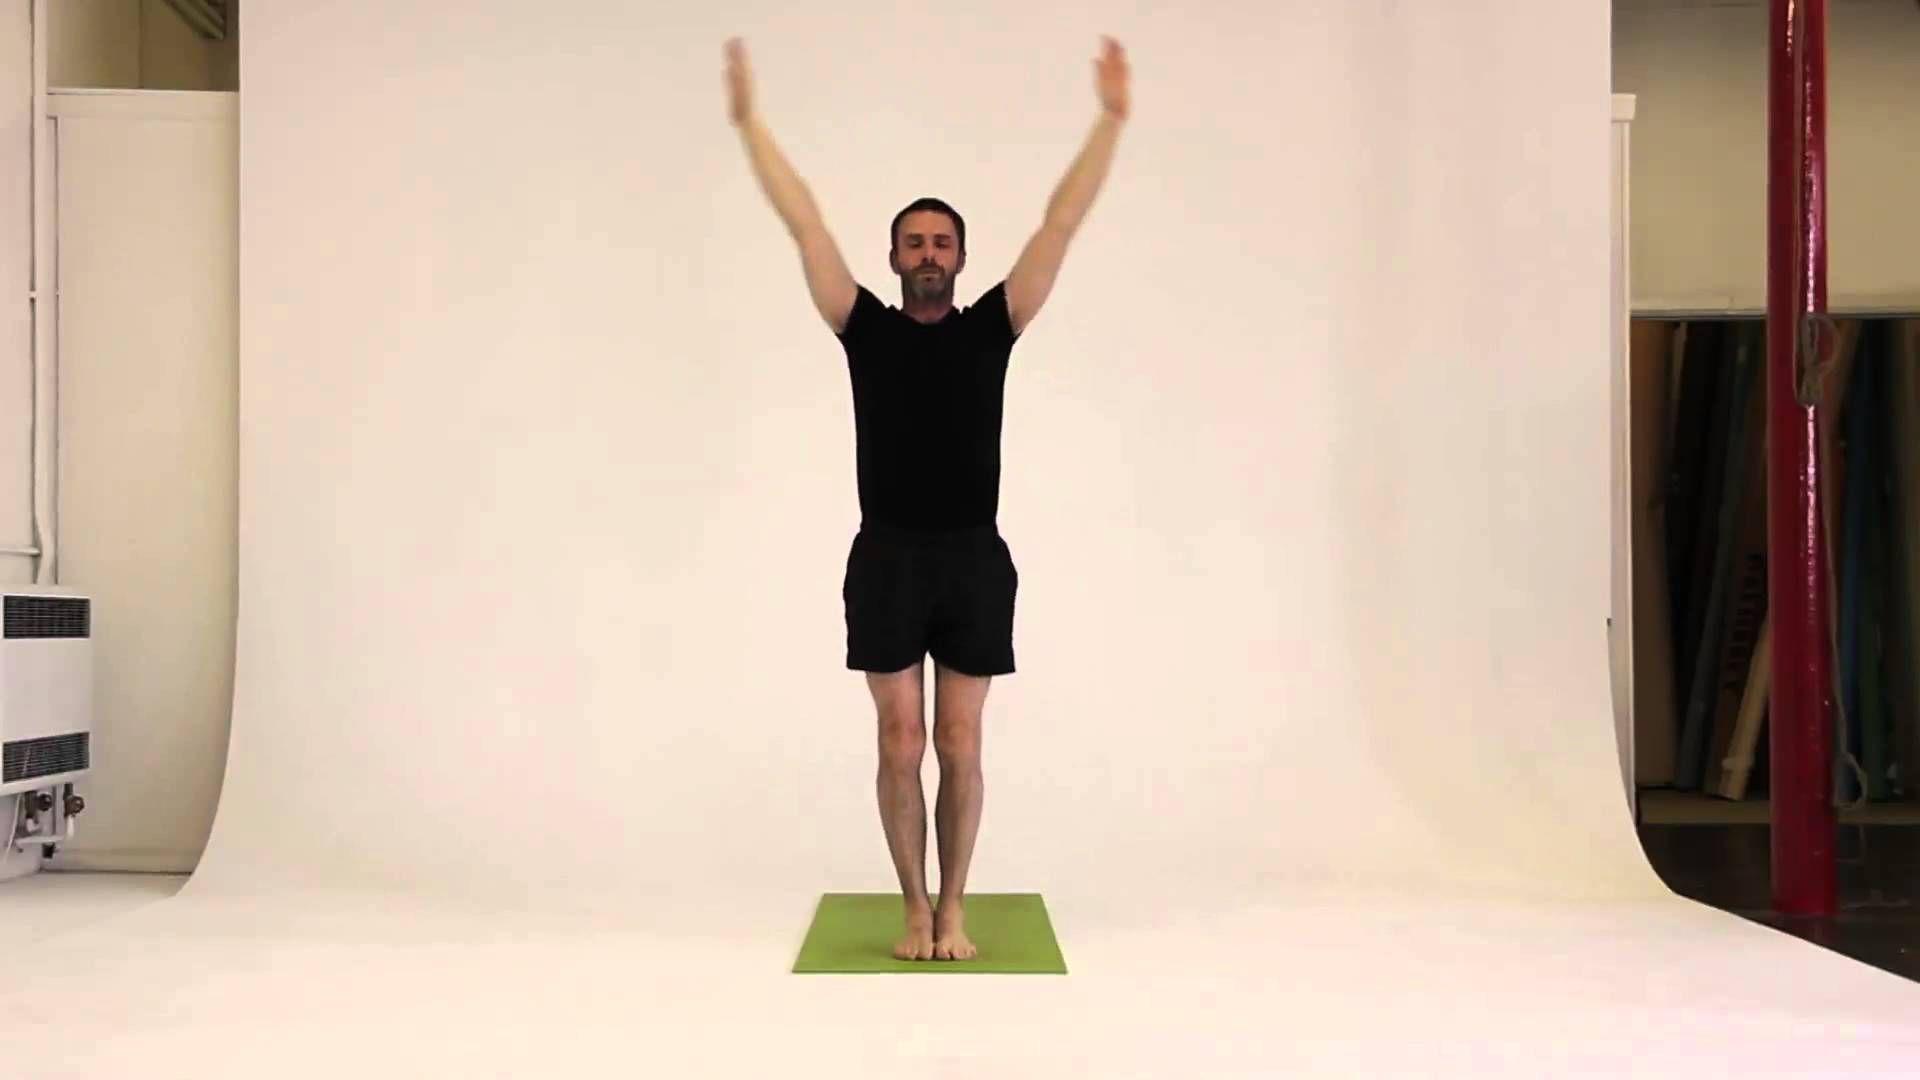 Ashtanga Yoga Guruji Pattabhi Jois Short Forms Demonstrated By Yoga Manchester S Matt Ryan Ashtanga Yoga Ashtanga Ashtanga Yoga Sequence